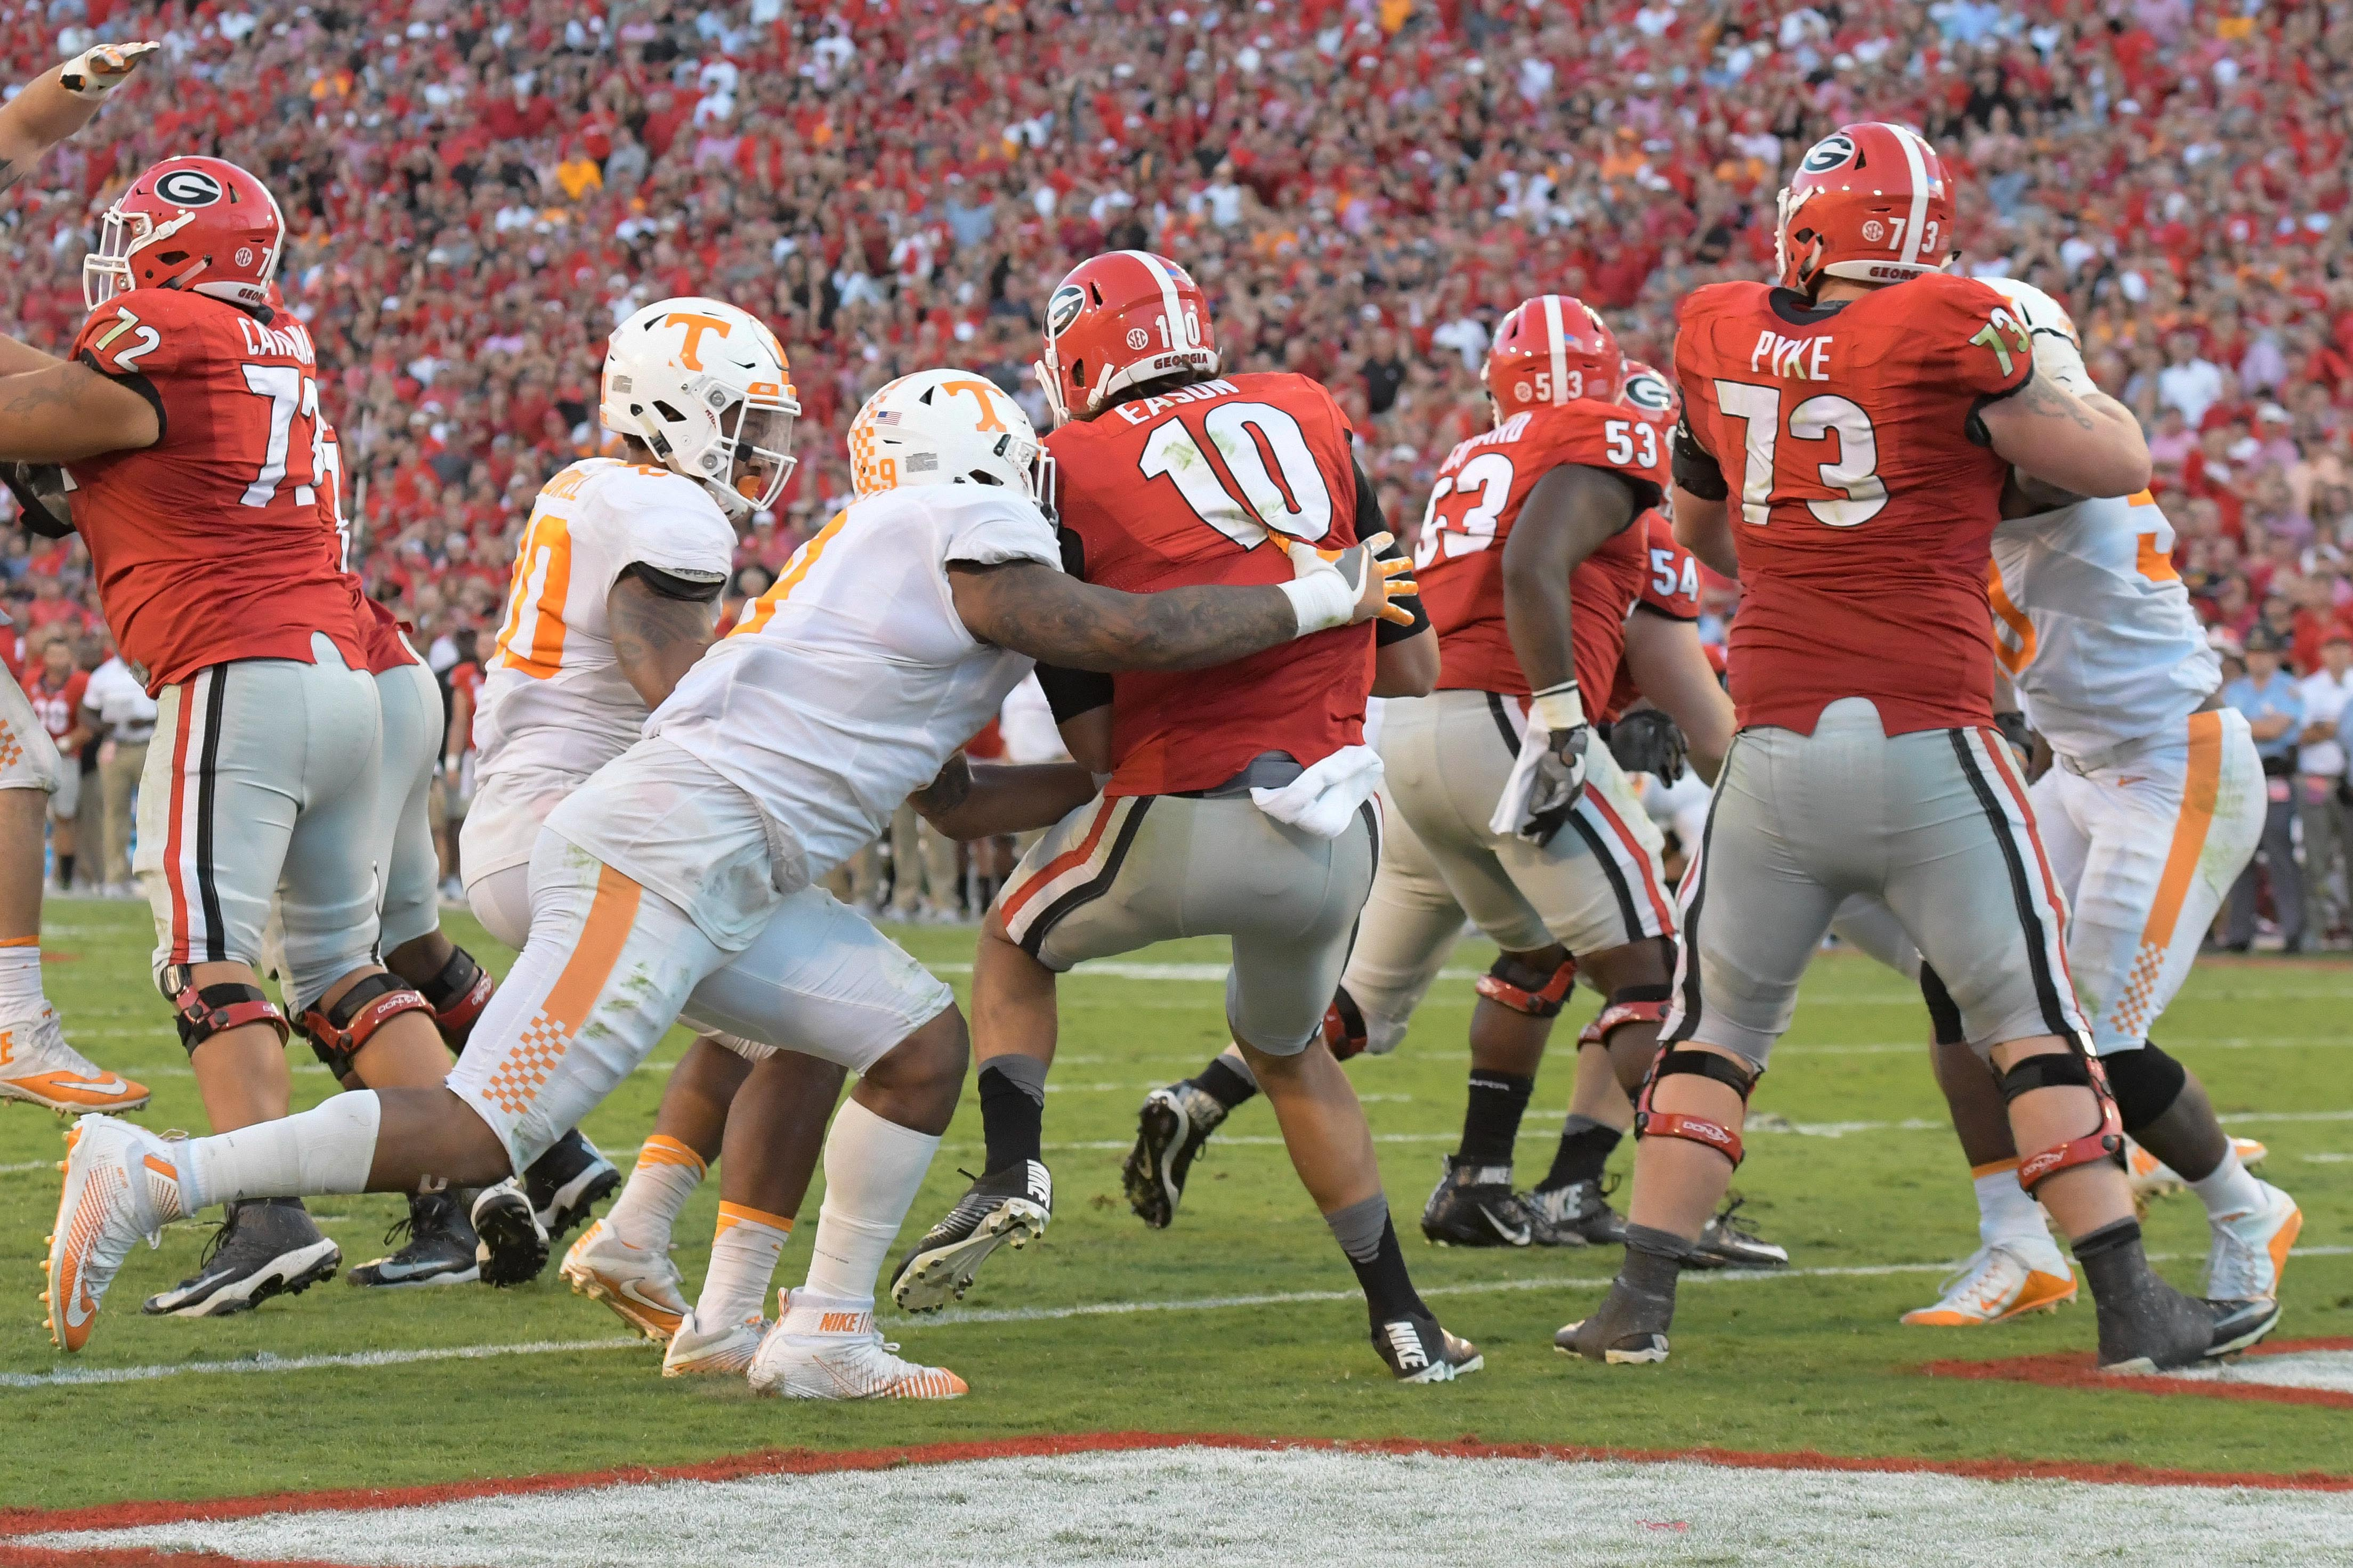 ATHENS, GA - Tennessee Volunteers pass rusher Derek Barnett (9) forces a sack-fumble out of Georgia Bulldogs quarterback Jacob Eason (10) at the goalline at Sanford Stadium.